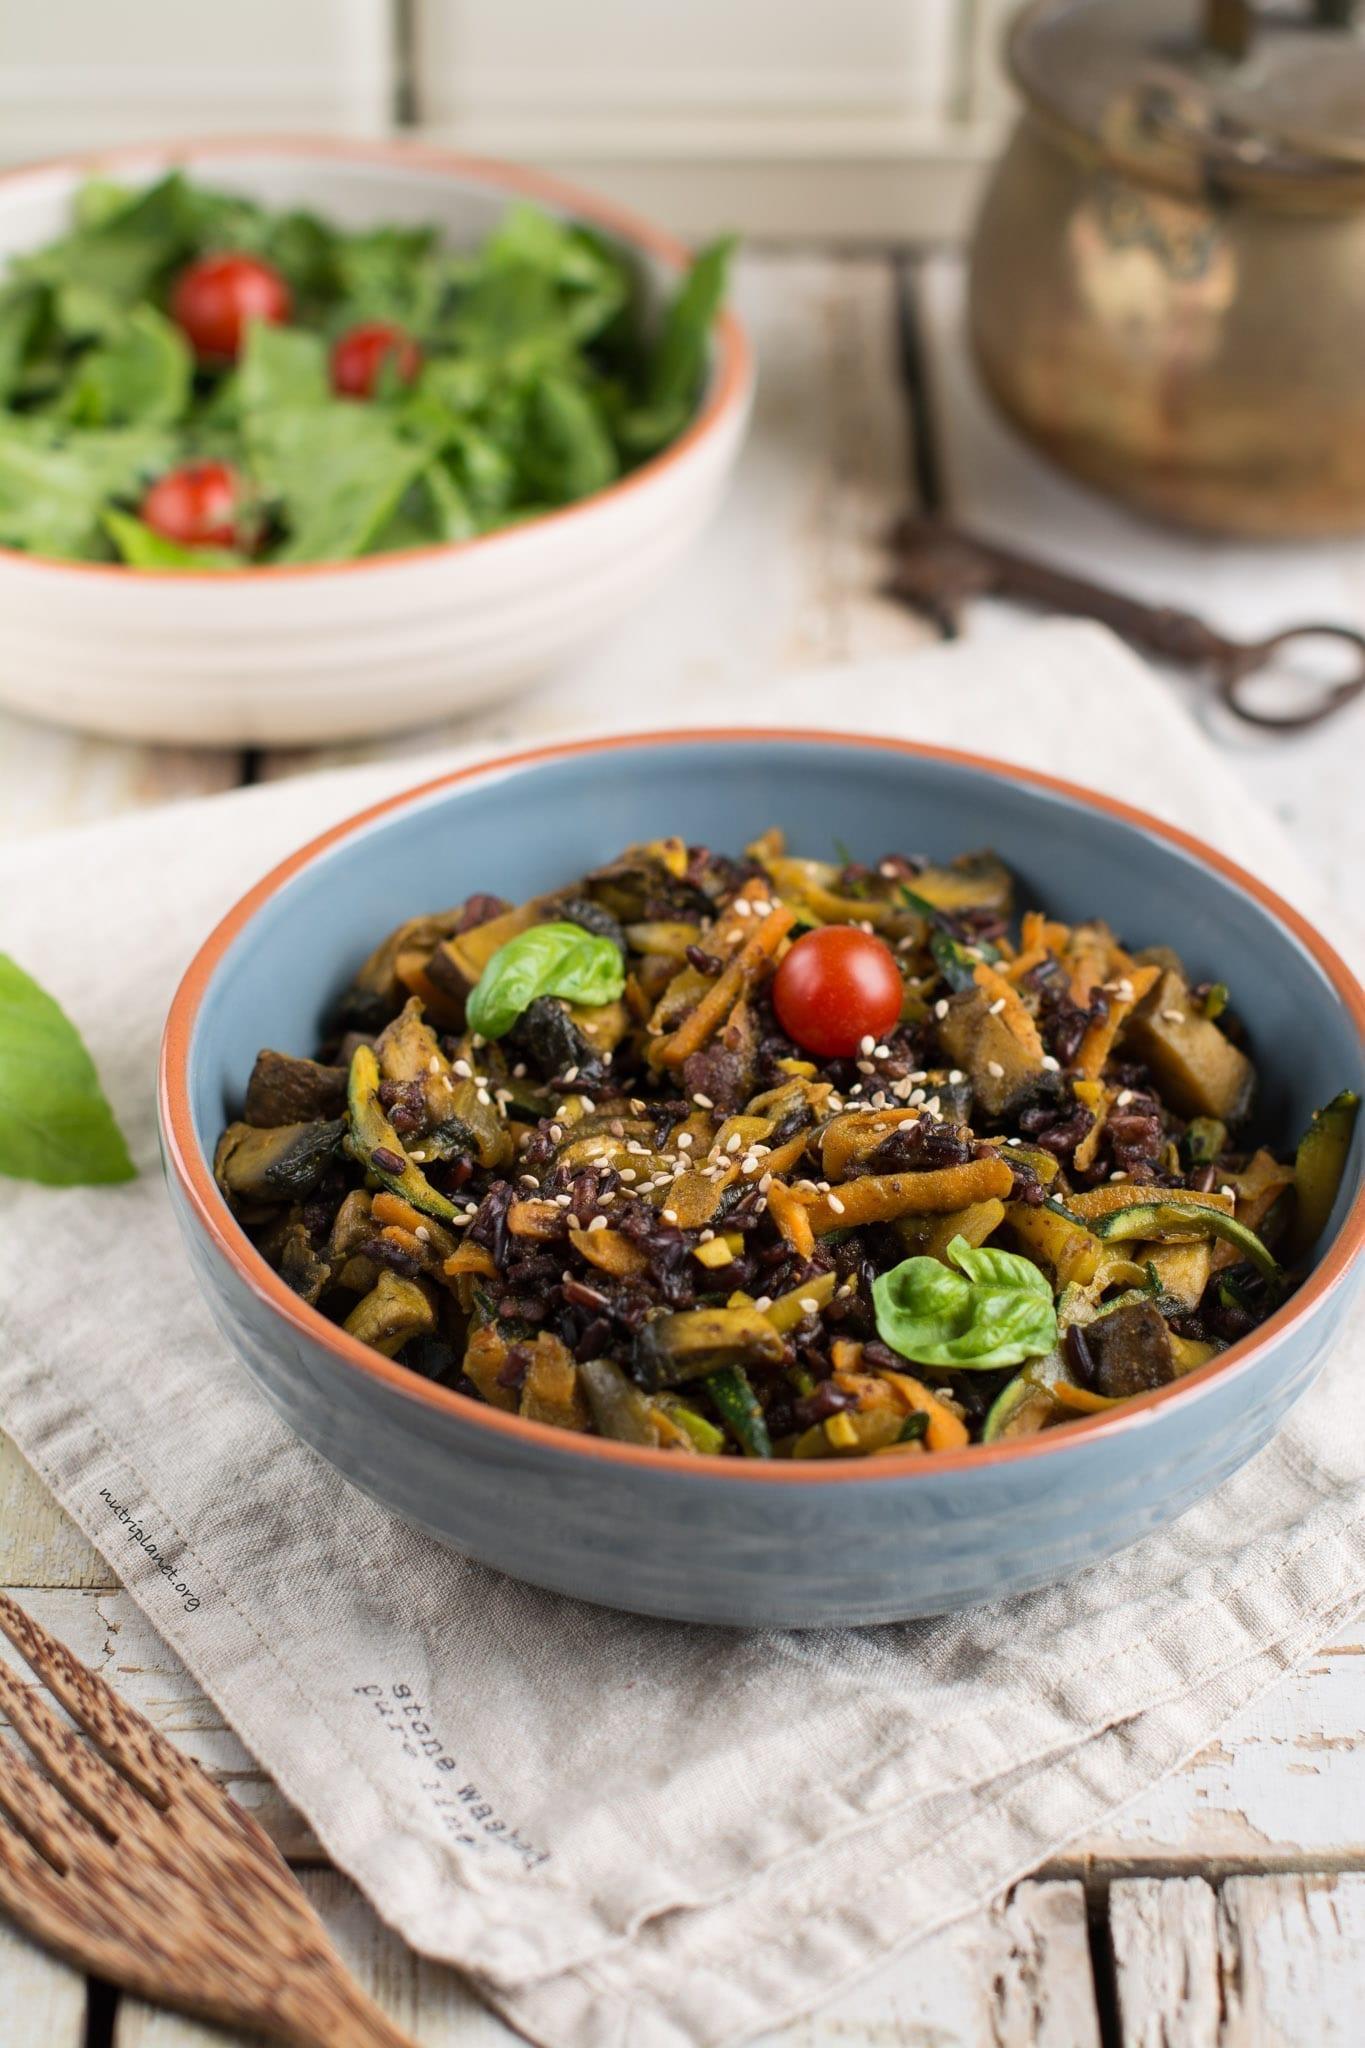 Simple Veggie Stir-Fry with Mushrooms [Vegan, Gluten-Free]